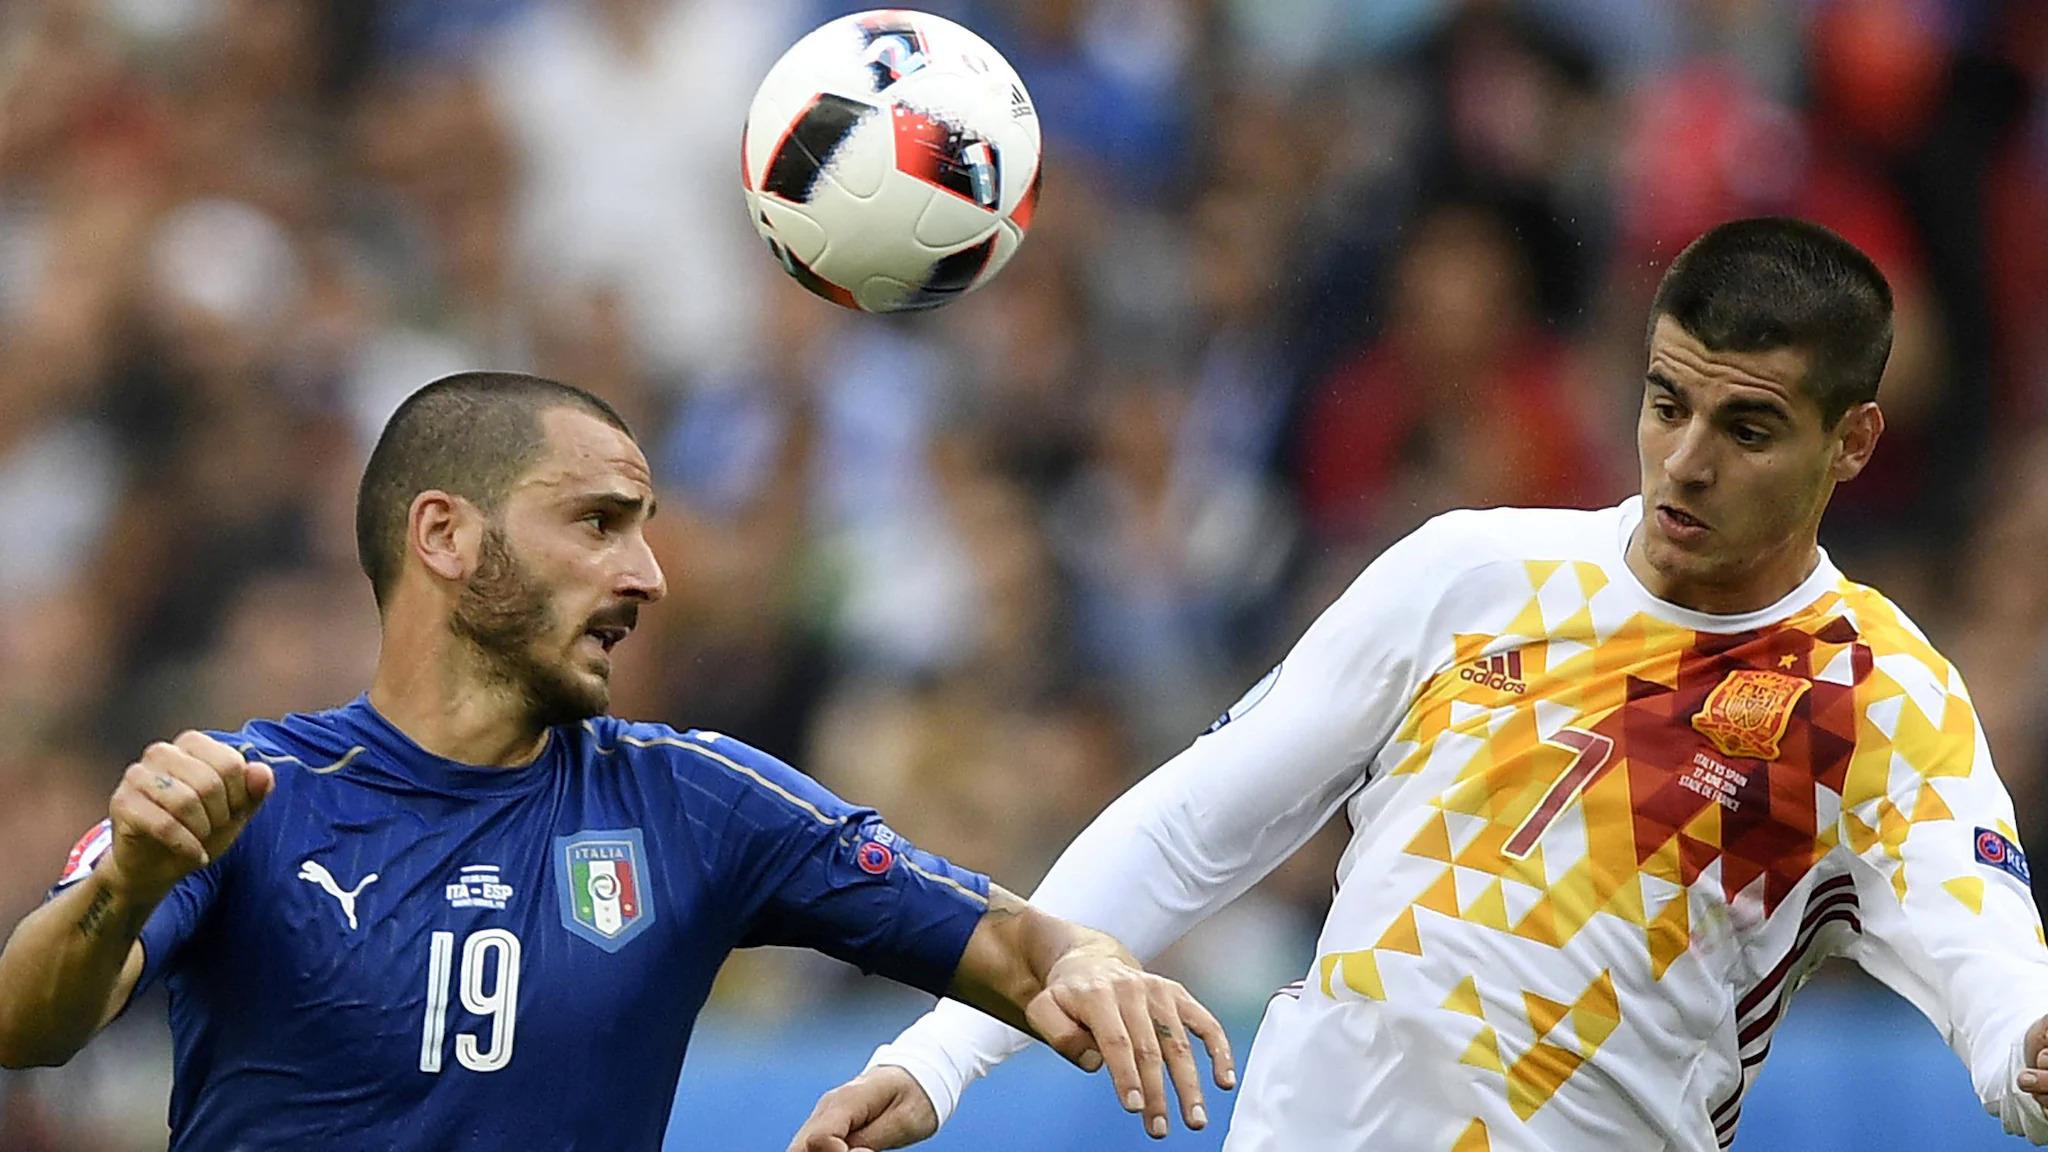 Pertahanan Italia, dengan bek tengah kawakan seperti Bonucci (No. 19), sangat diapresiasi Mourinho.  Foto: UEFA